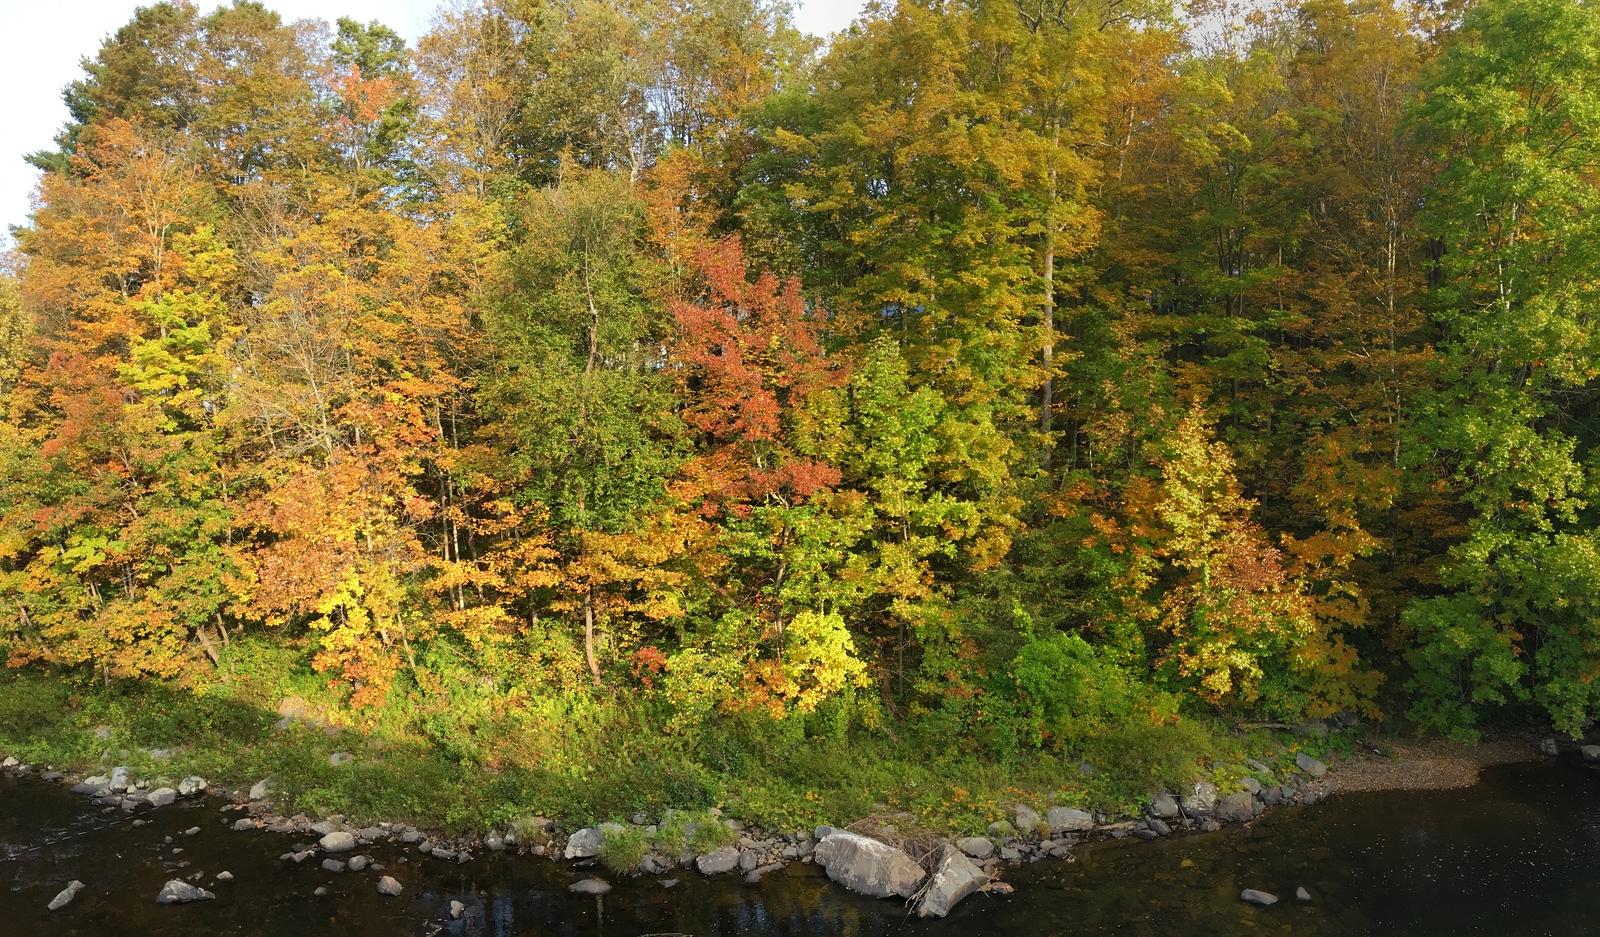 Autumn in full swing